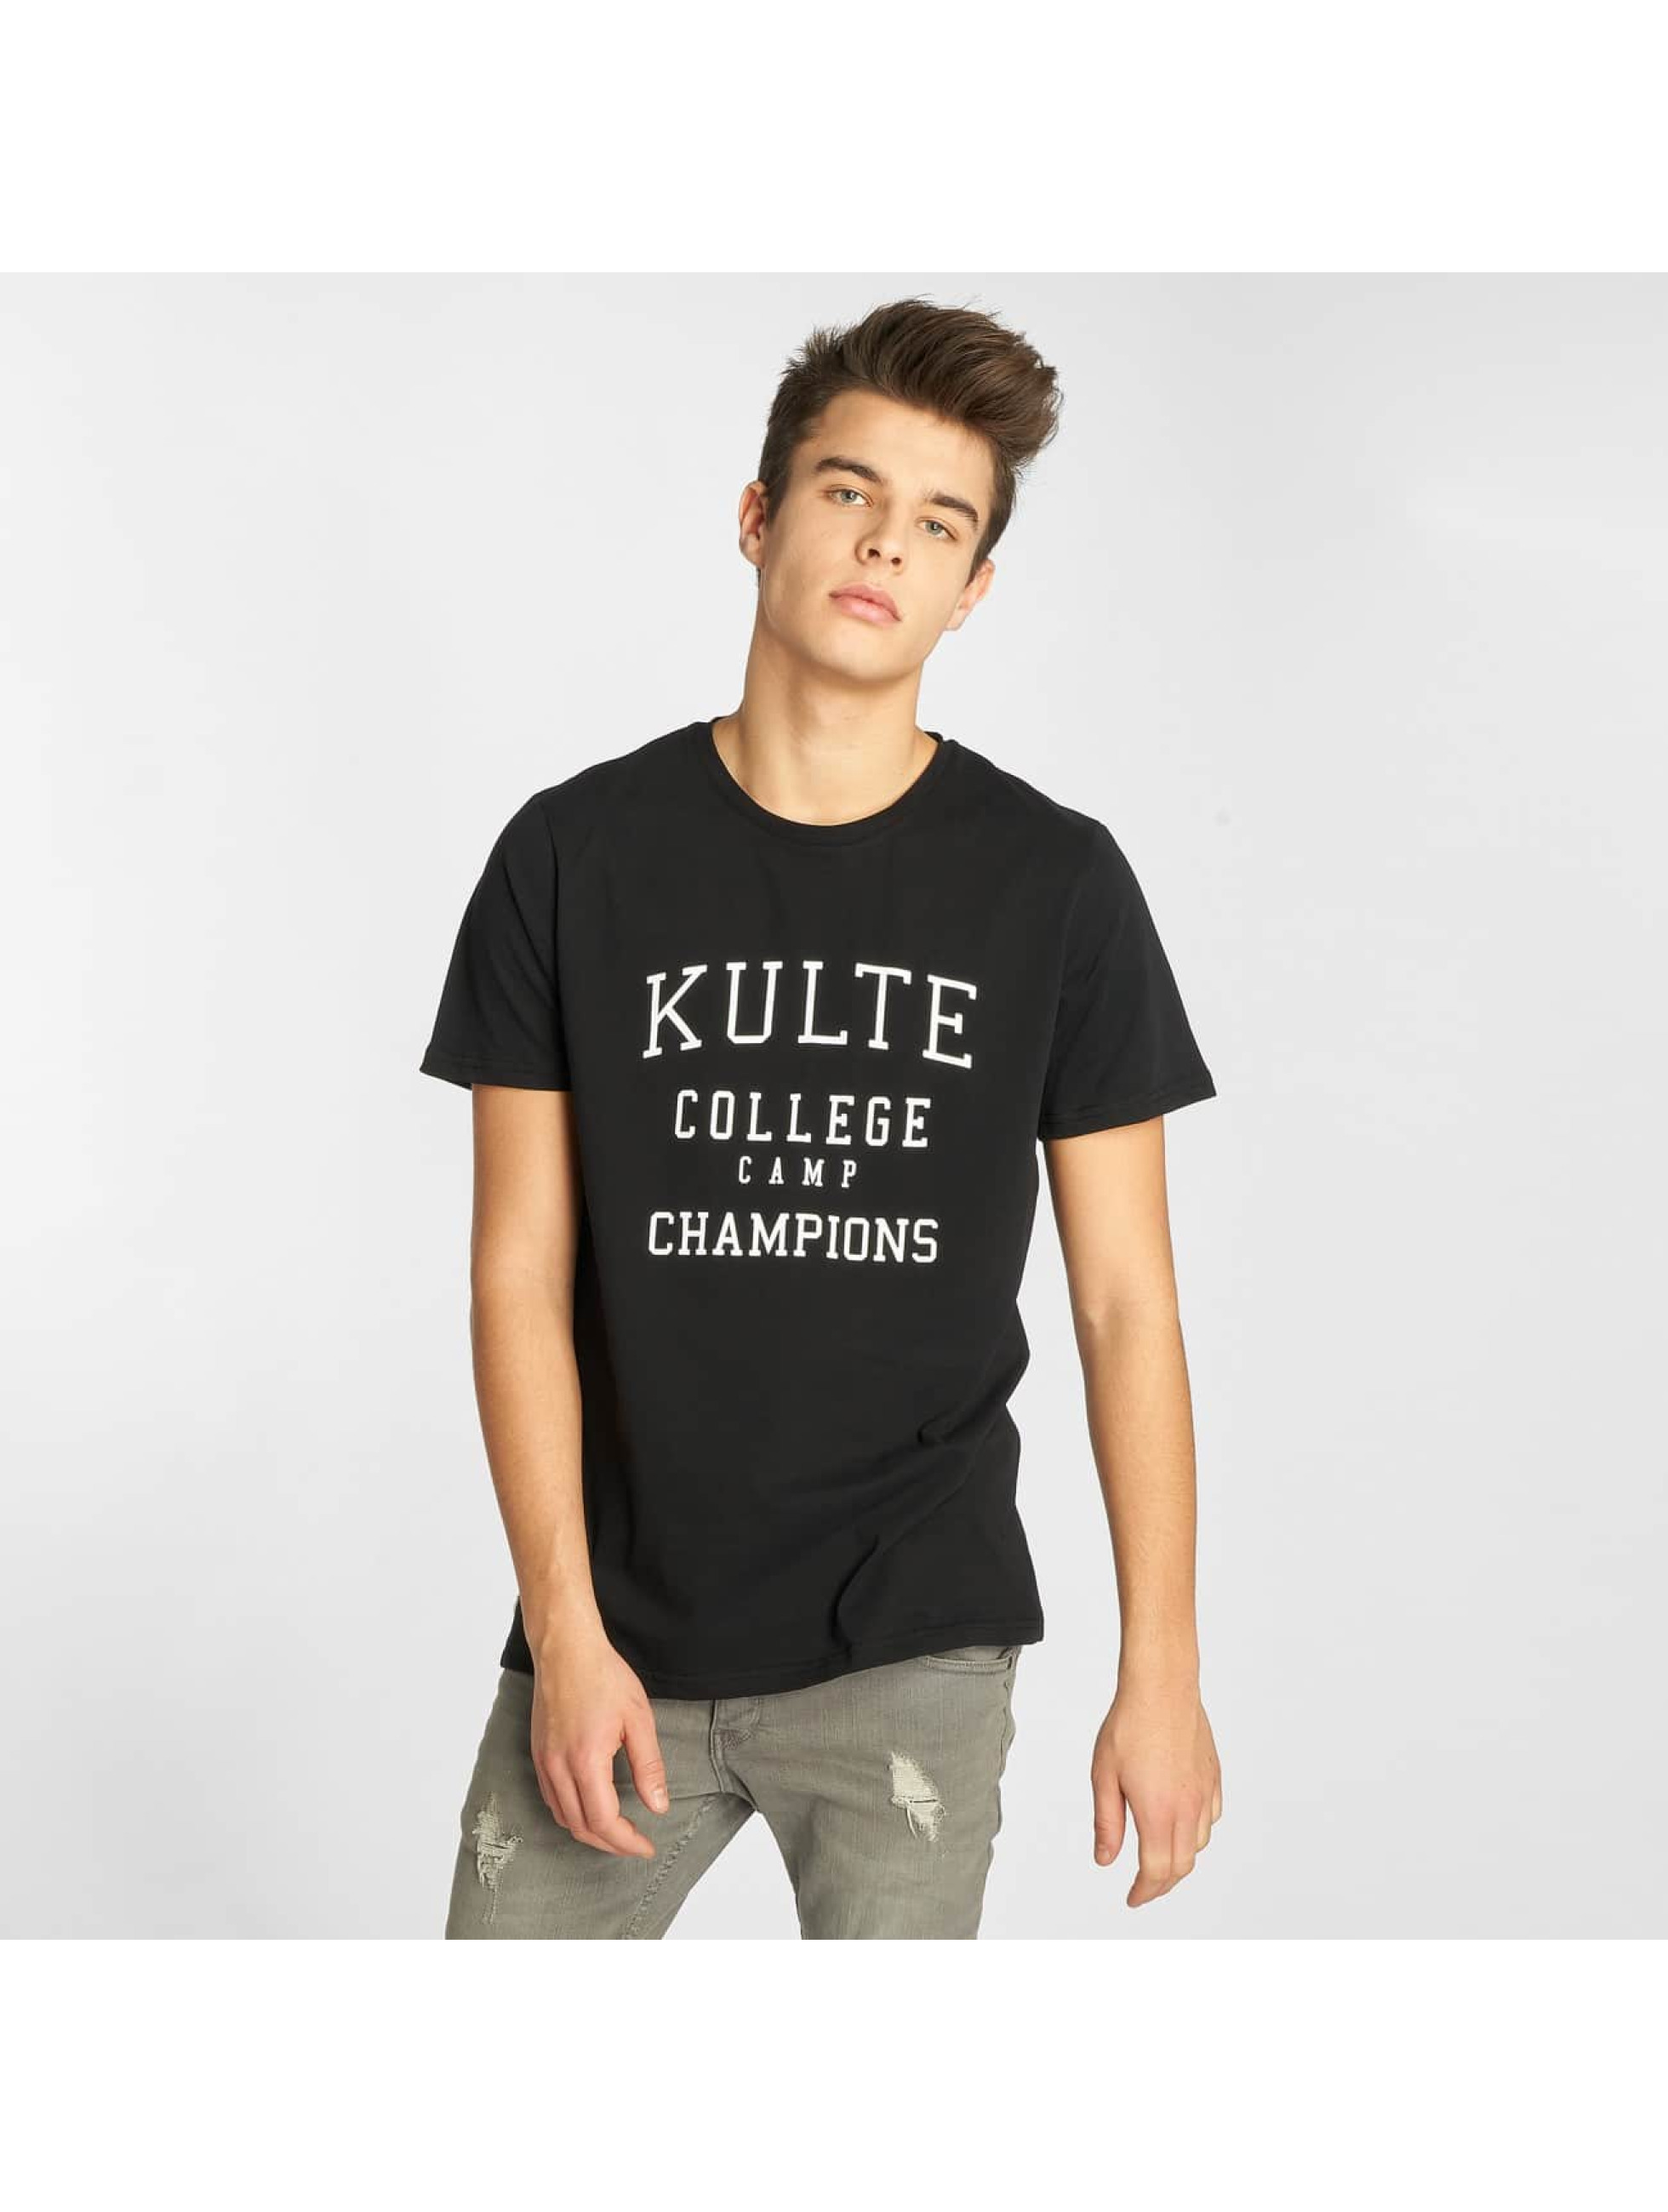 Kulte T-Shirt Corpo College Champion schwarz